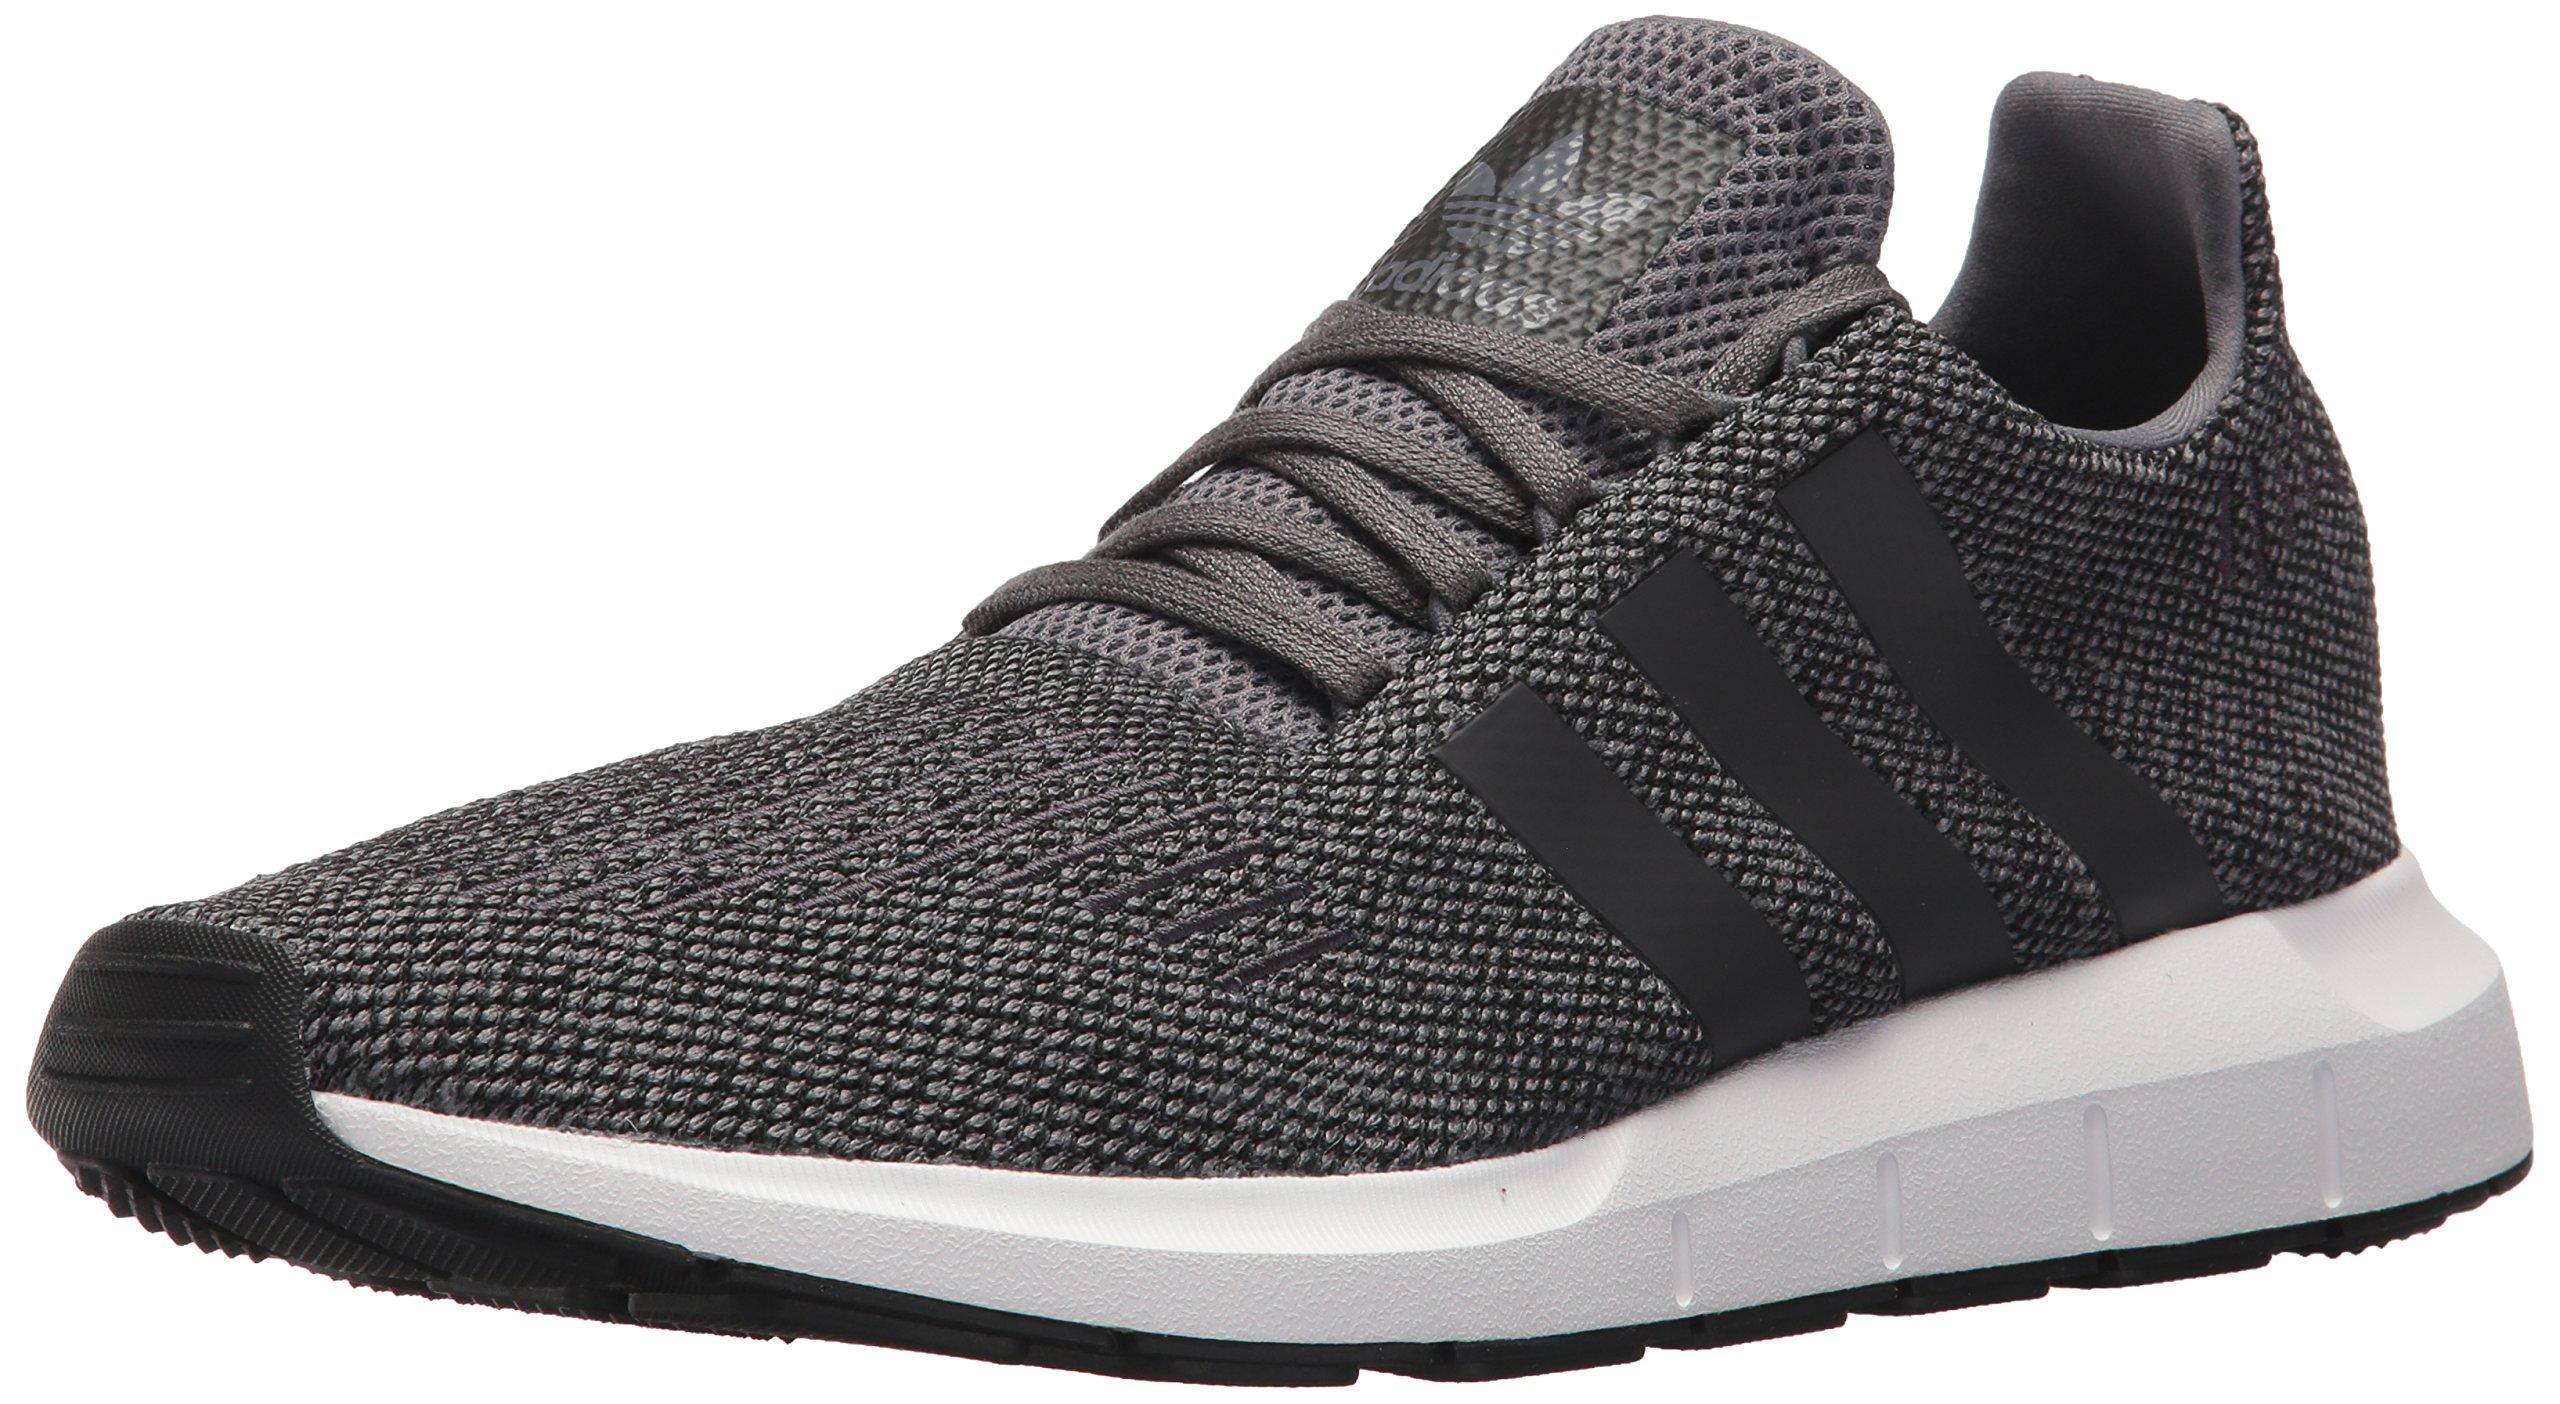 adidas Originals Men's Swift Running Shoe, Grey/Black/White, 10 M US